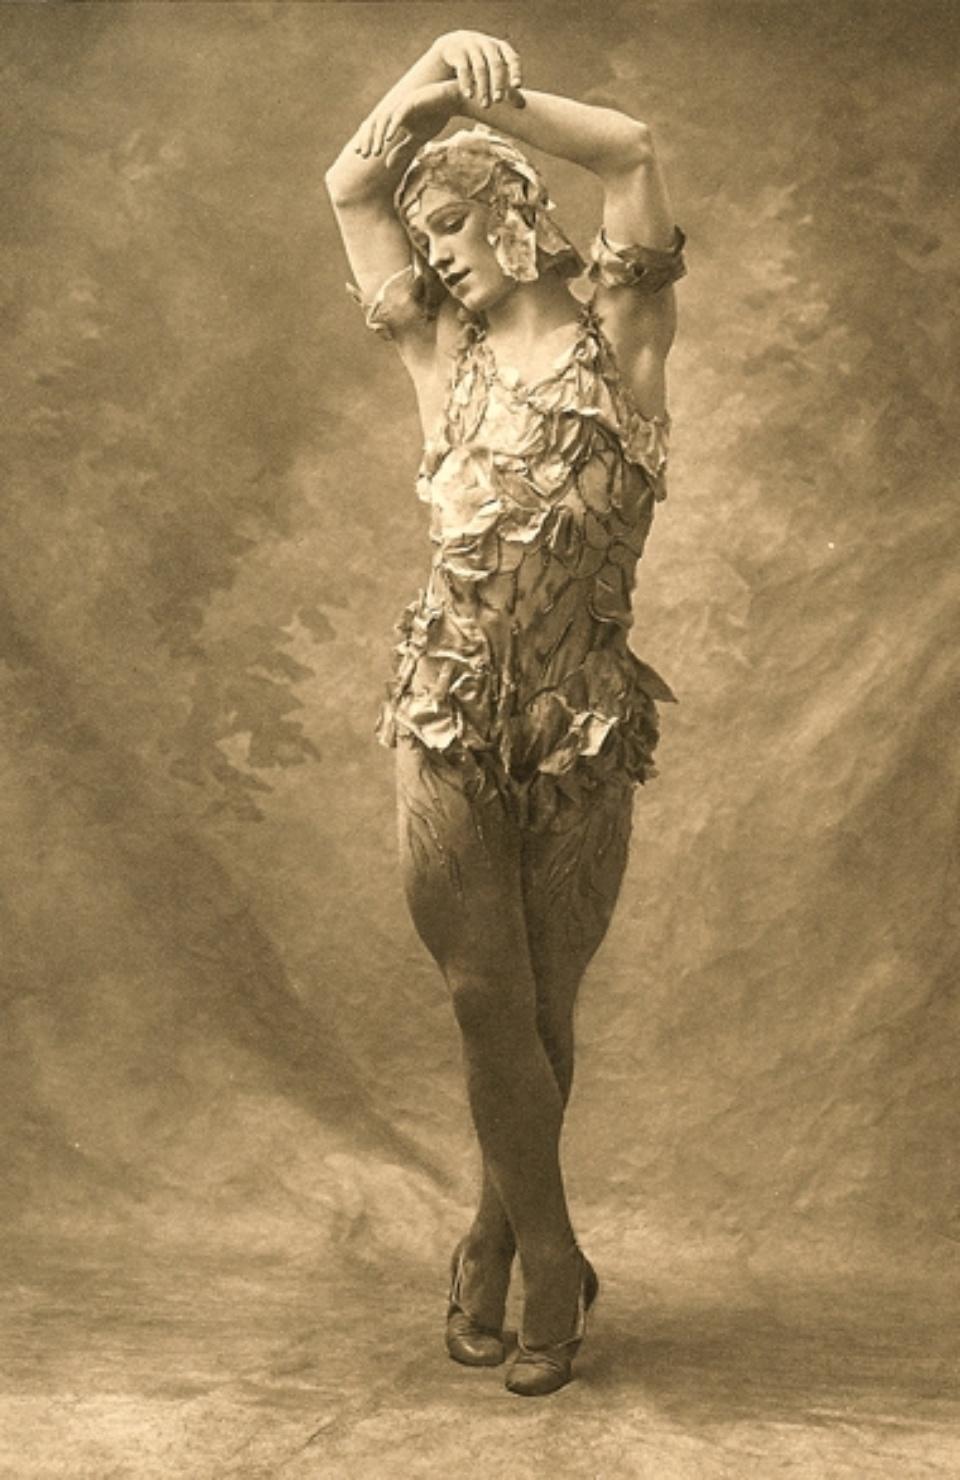 E.O. Hoppé Vaslav Nijinsky, Le Spectre de la Rose 1911 Photogravüre